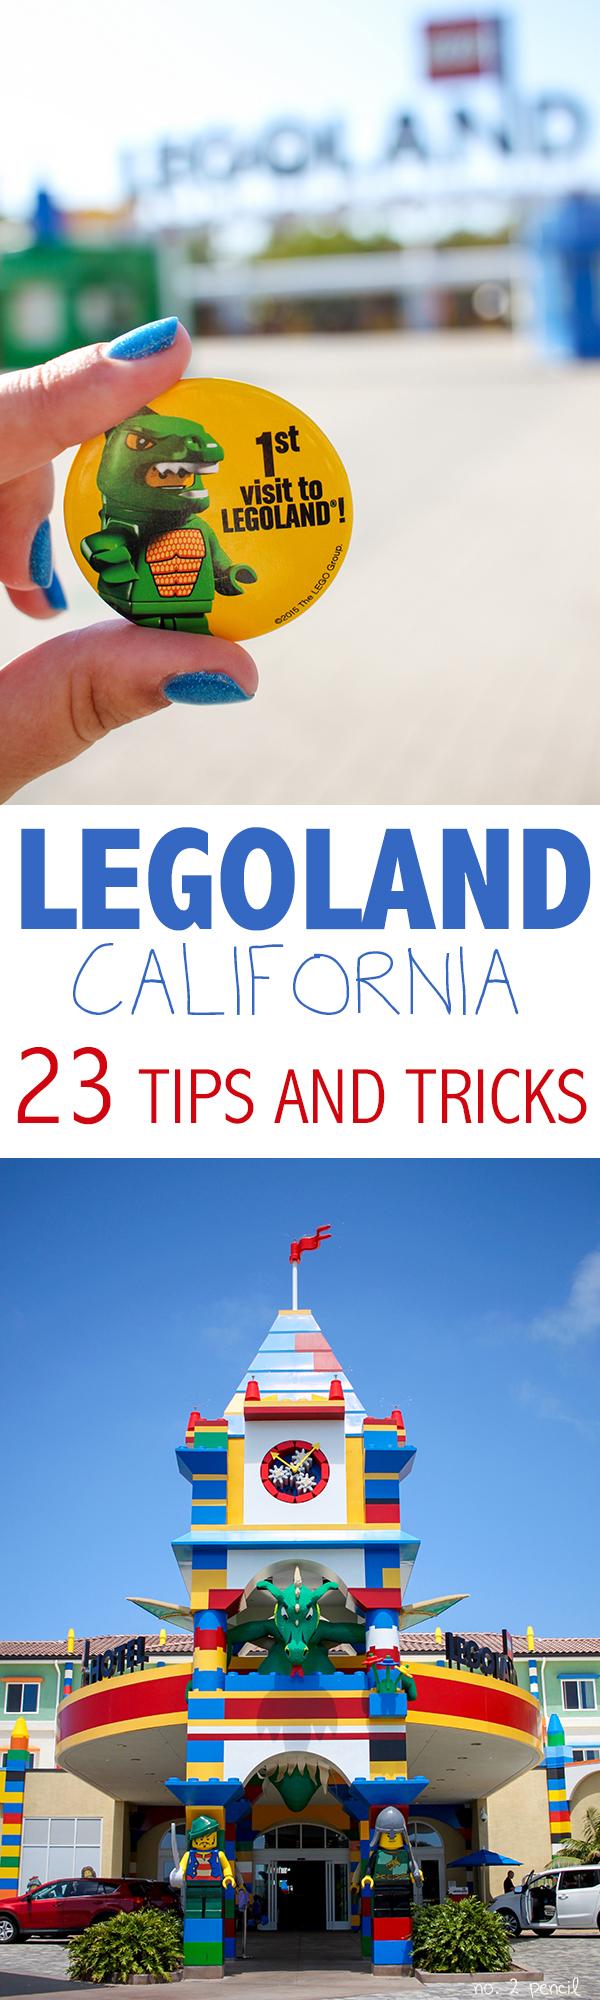 Legoland California Tips And Tricks No 2 Pencil